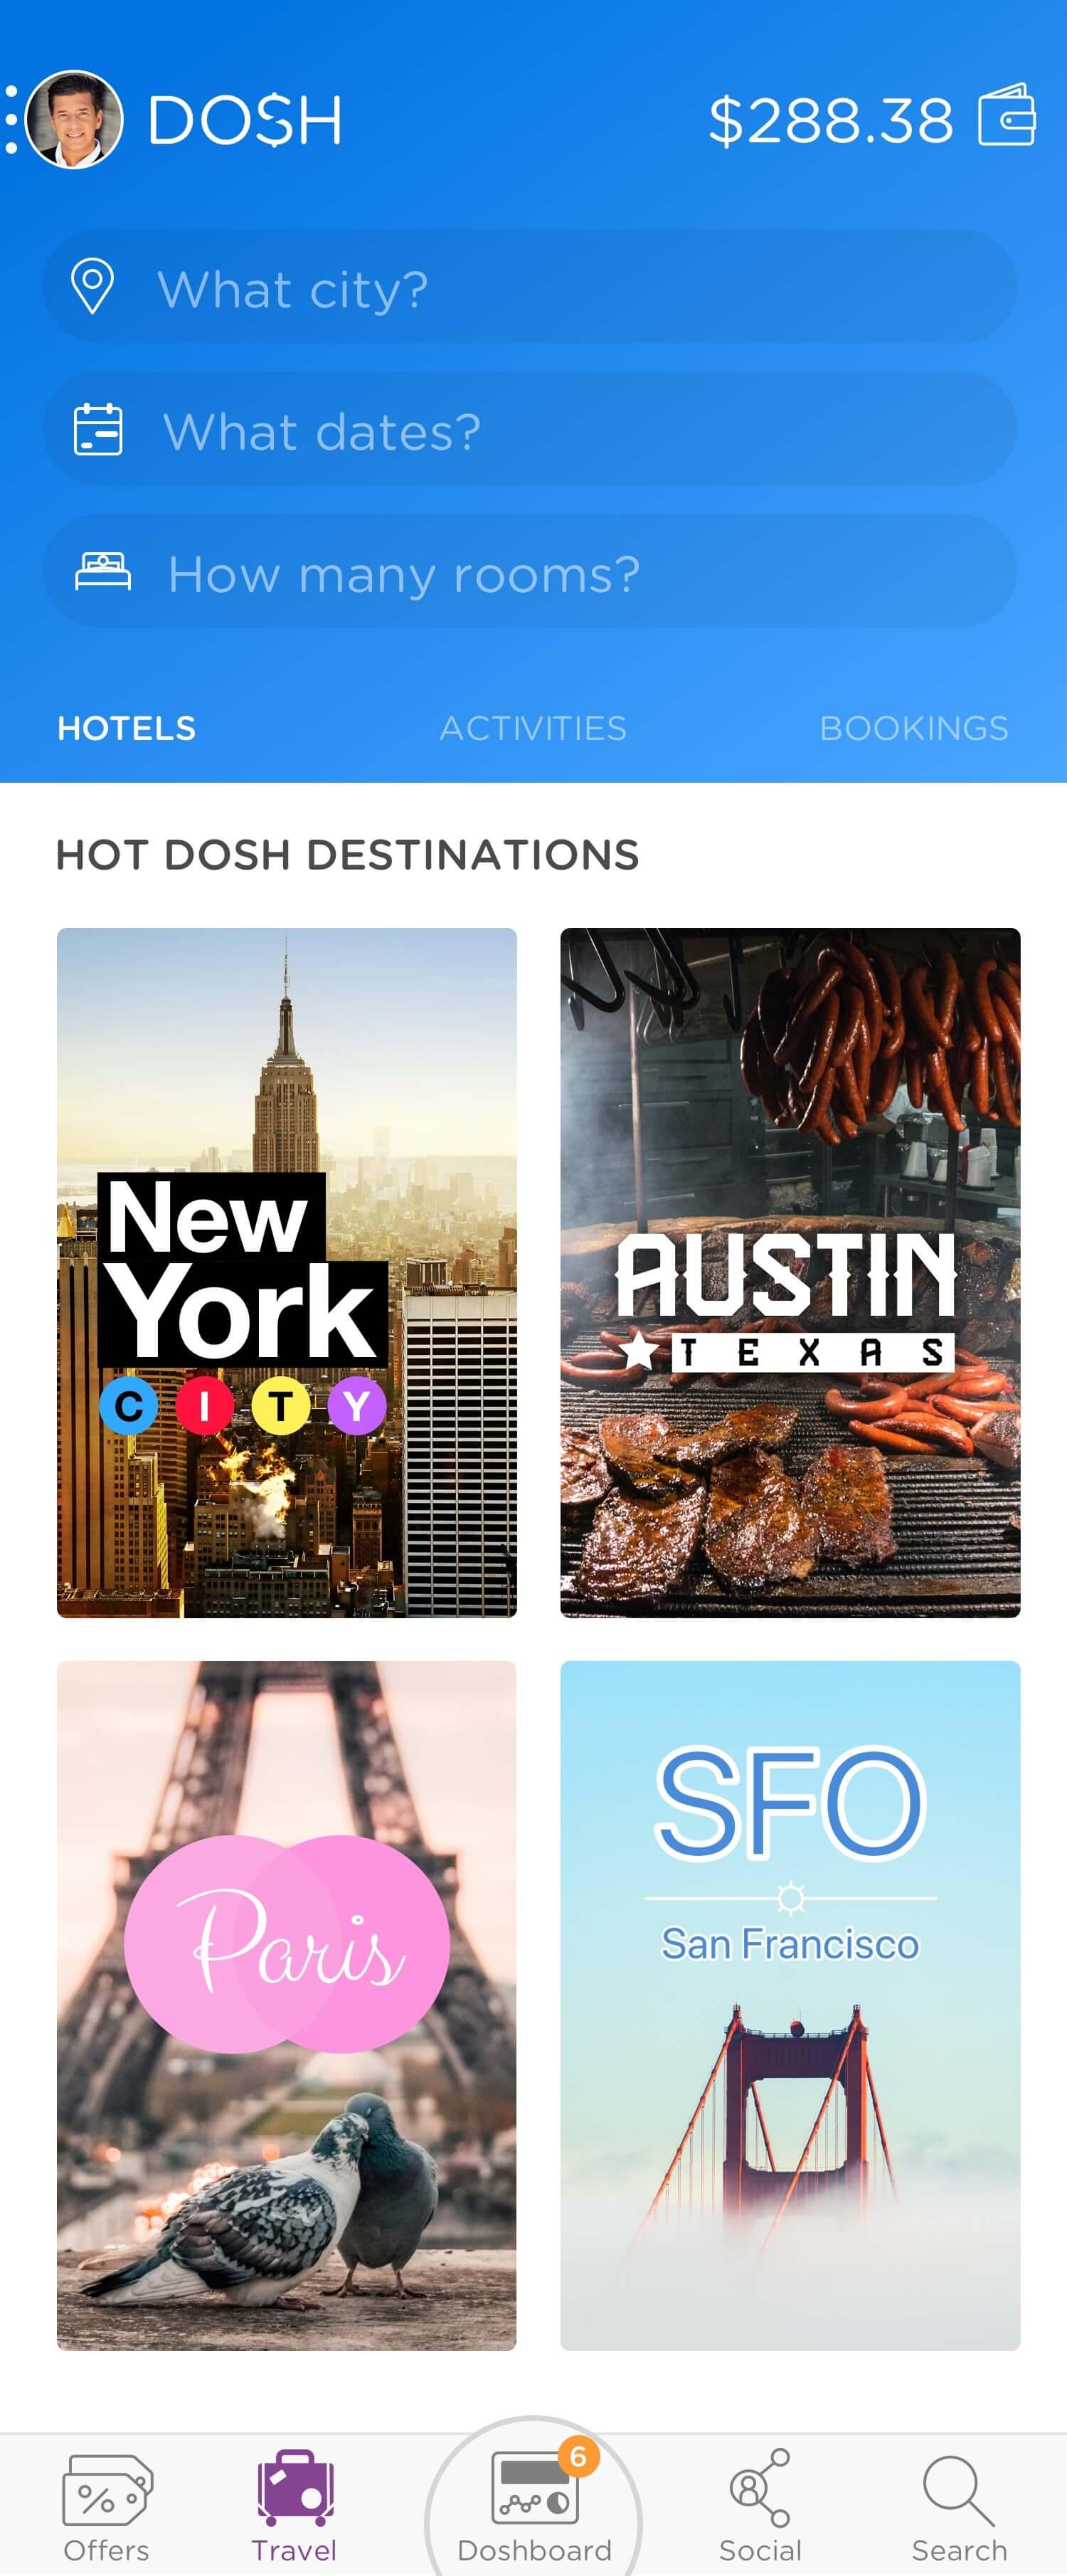 DOSH app Travel: Showing edit mode for destination, date and rooms Rocksauce Studios